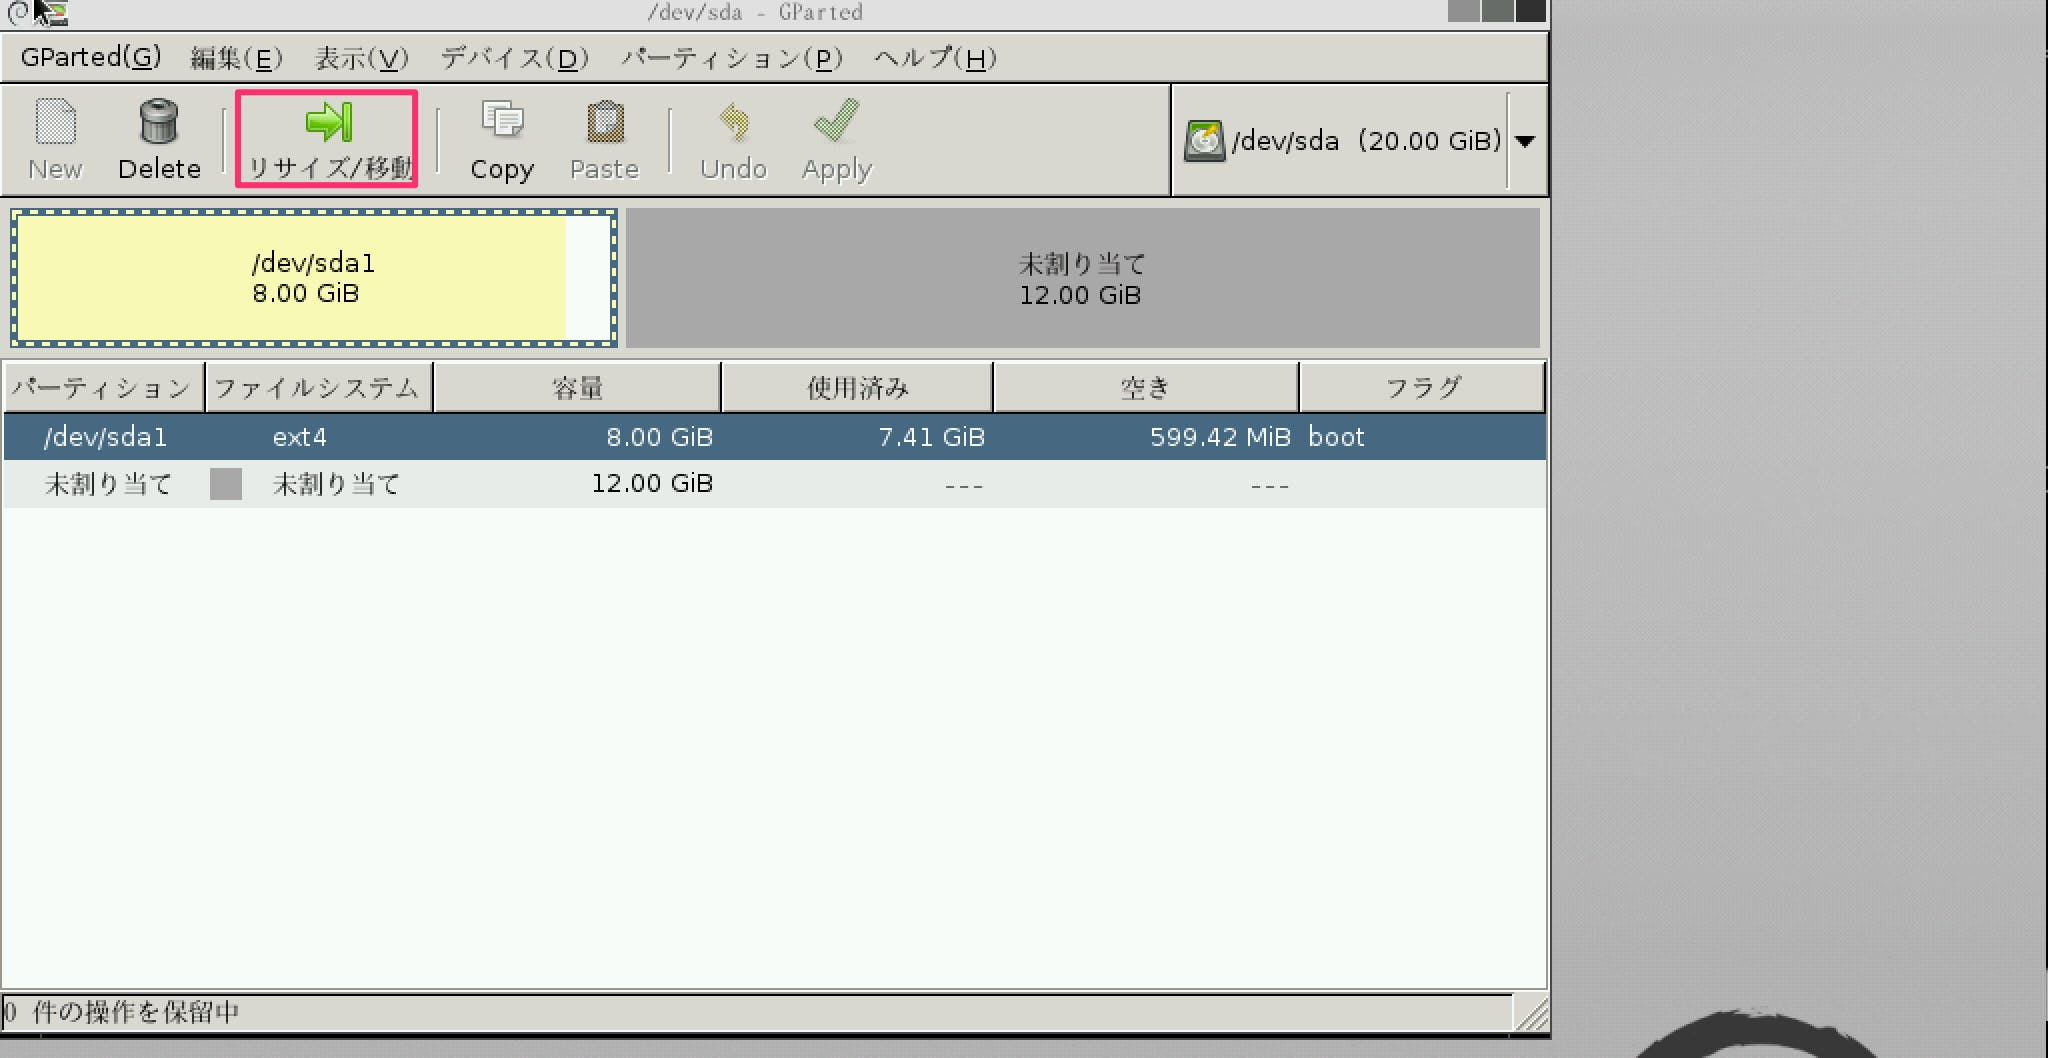 FC_default_1457173043946_65450__Running__と_Vagrant_Virtualbox_のディスク_ストレージ_容量を増やす方法.png